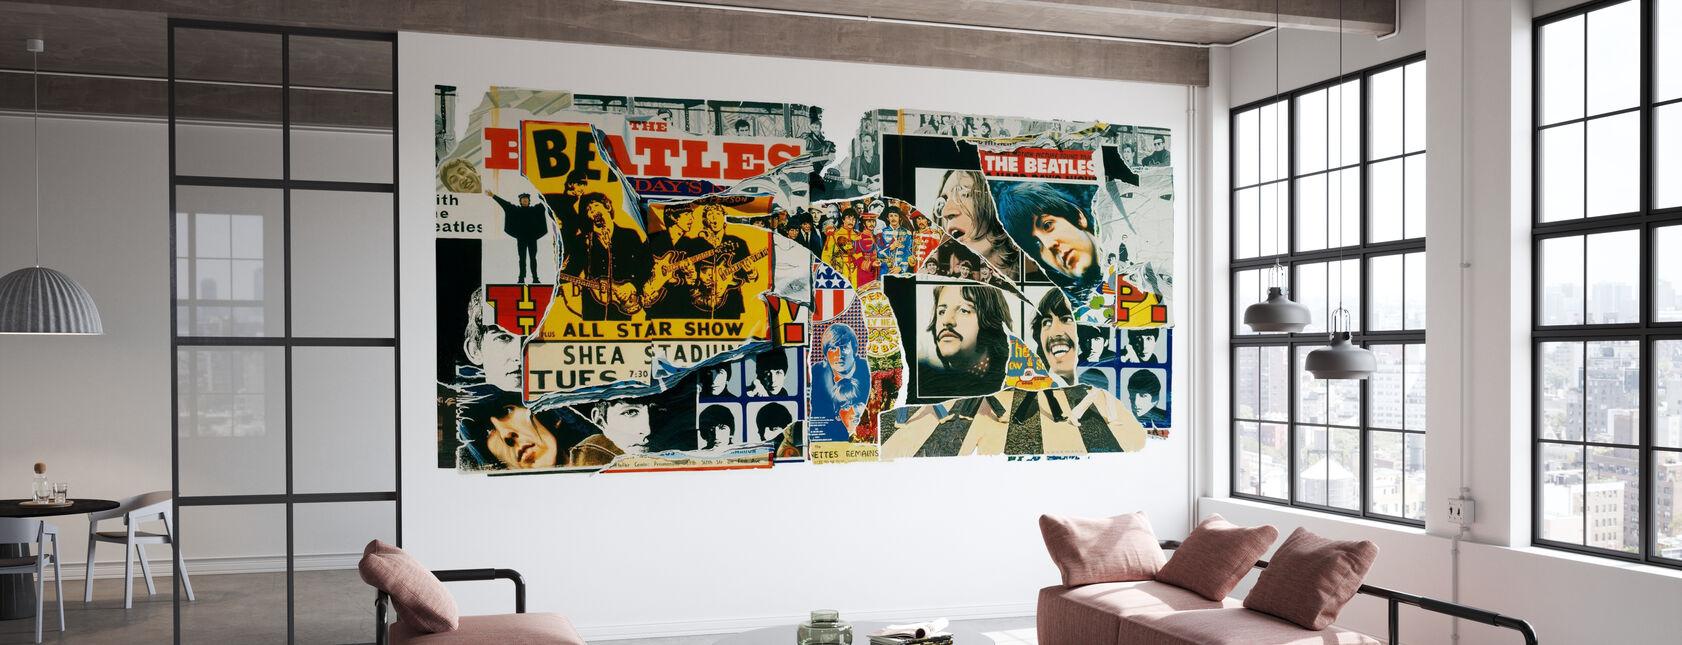 Beatles - Posters vintage - Papel pintado - Oficina